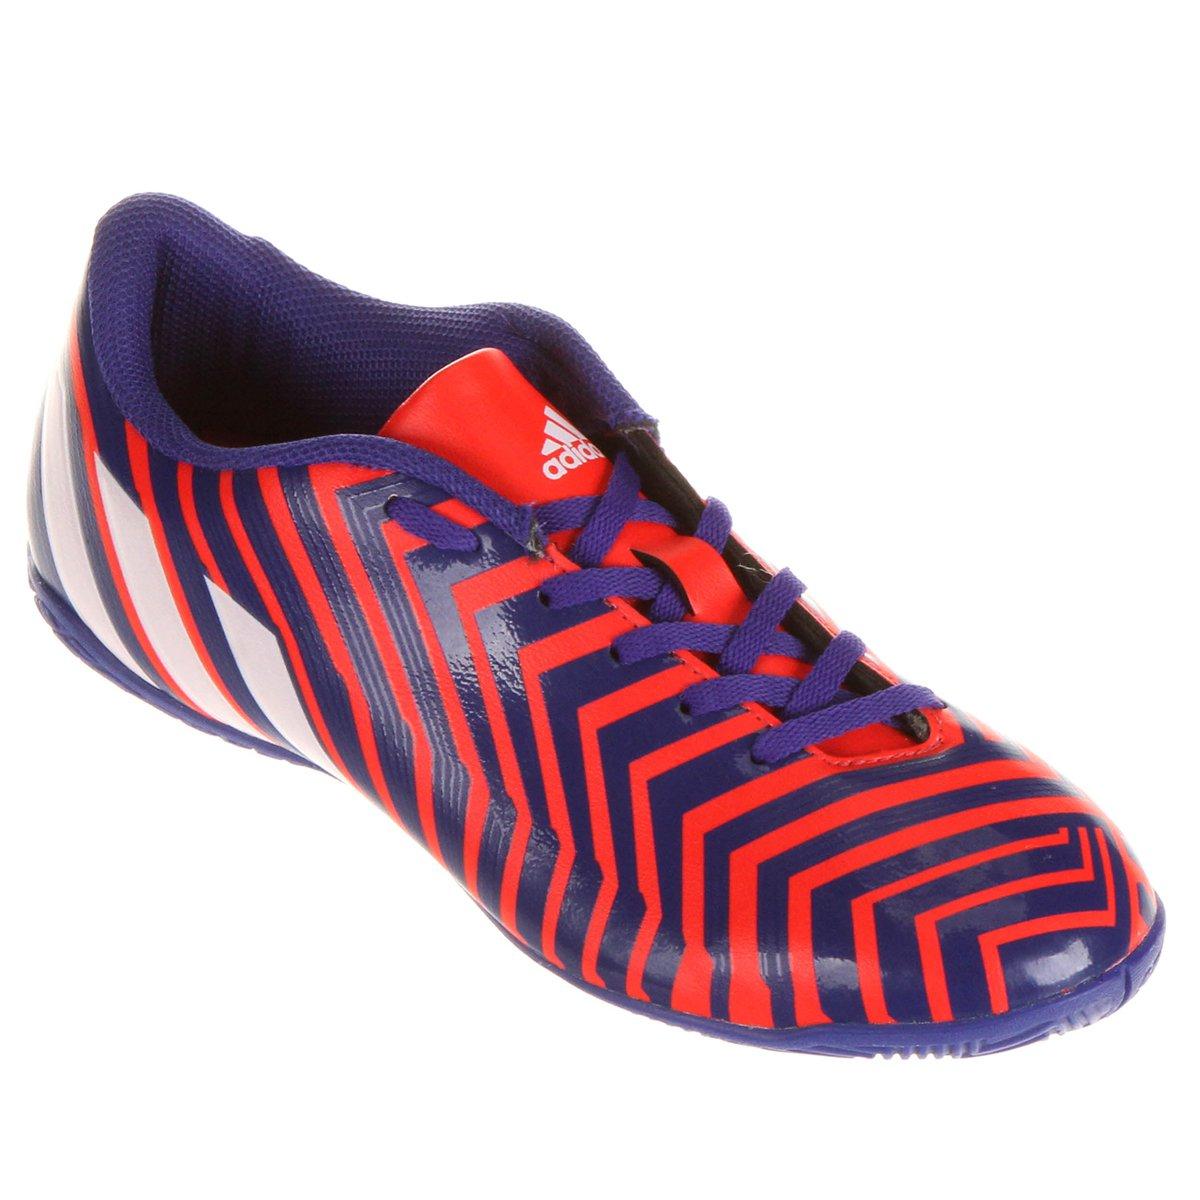 825eab56ec Chuteira Adidas Predito Instinct IN Futsal